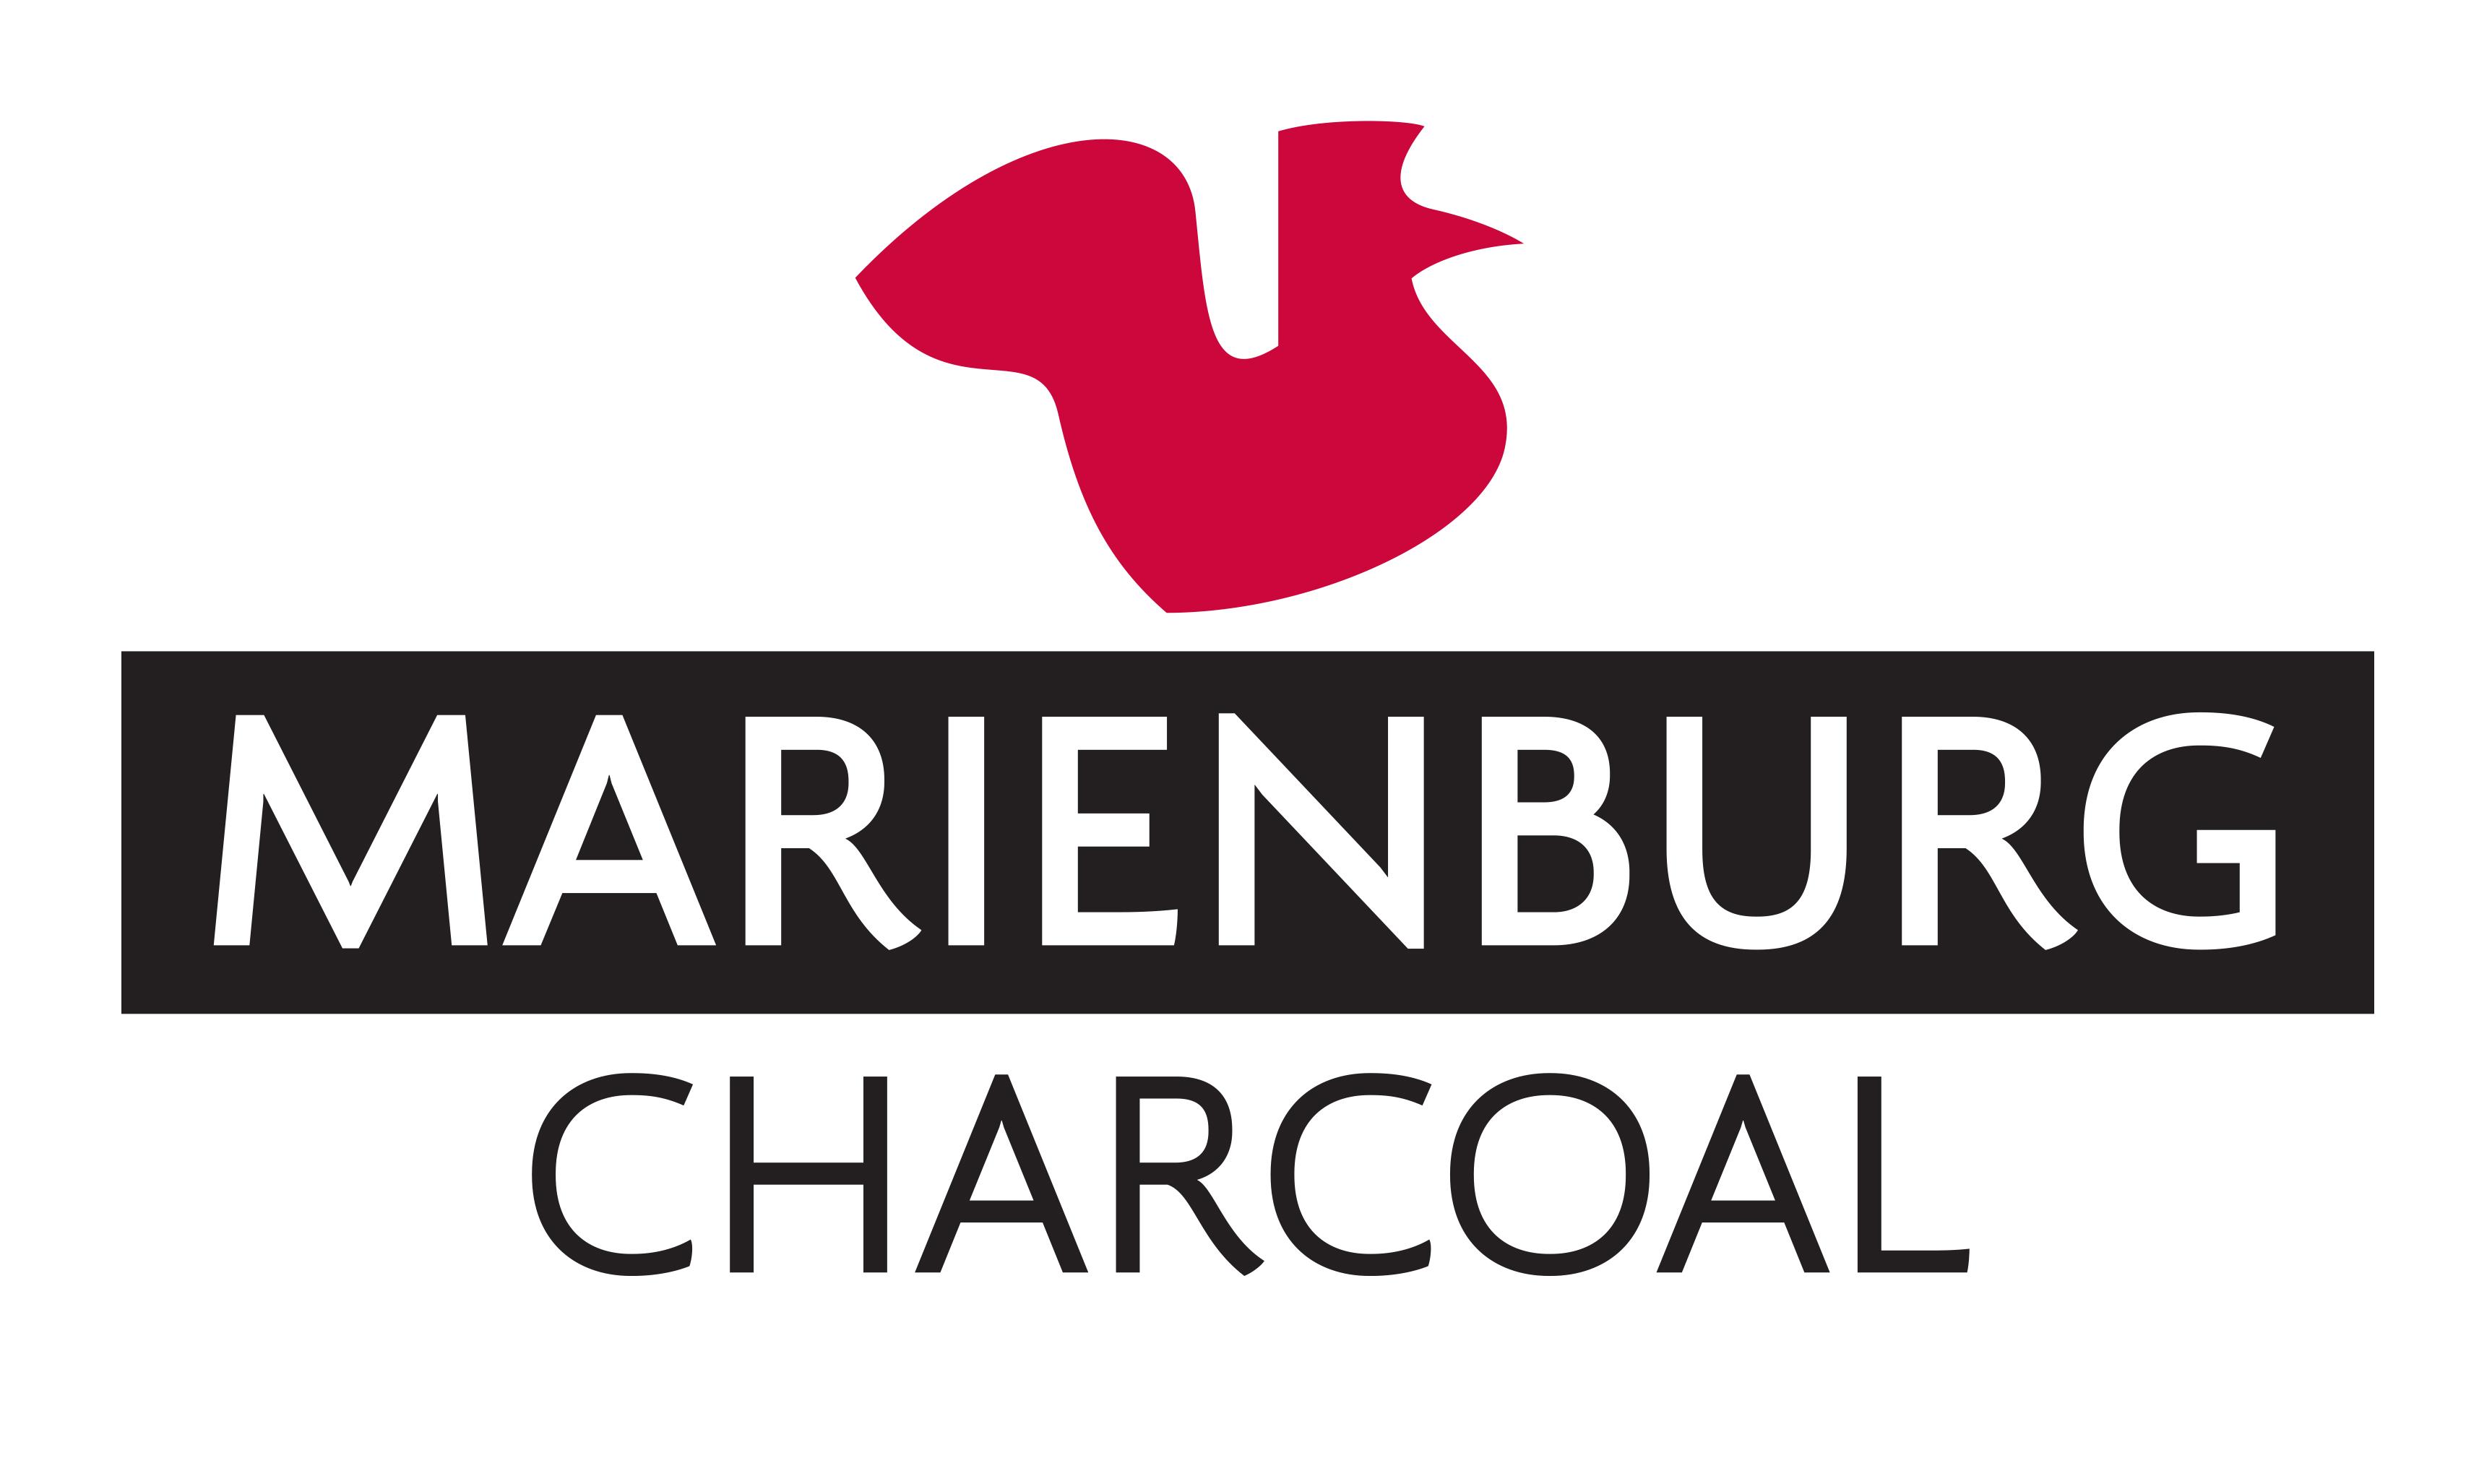 Marienburg-Charcoal-logo-big